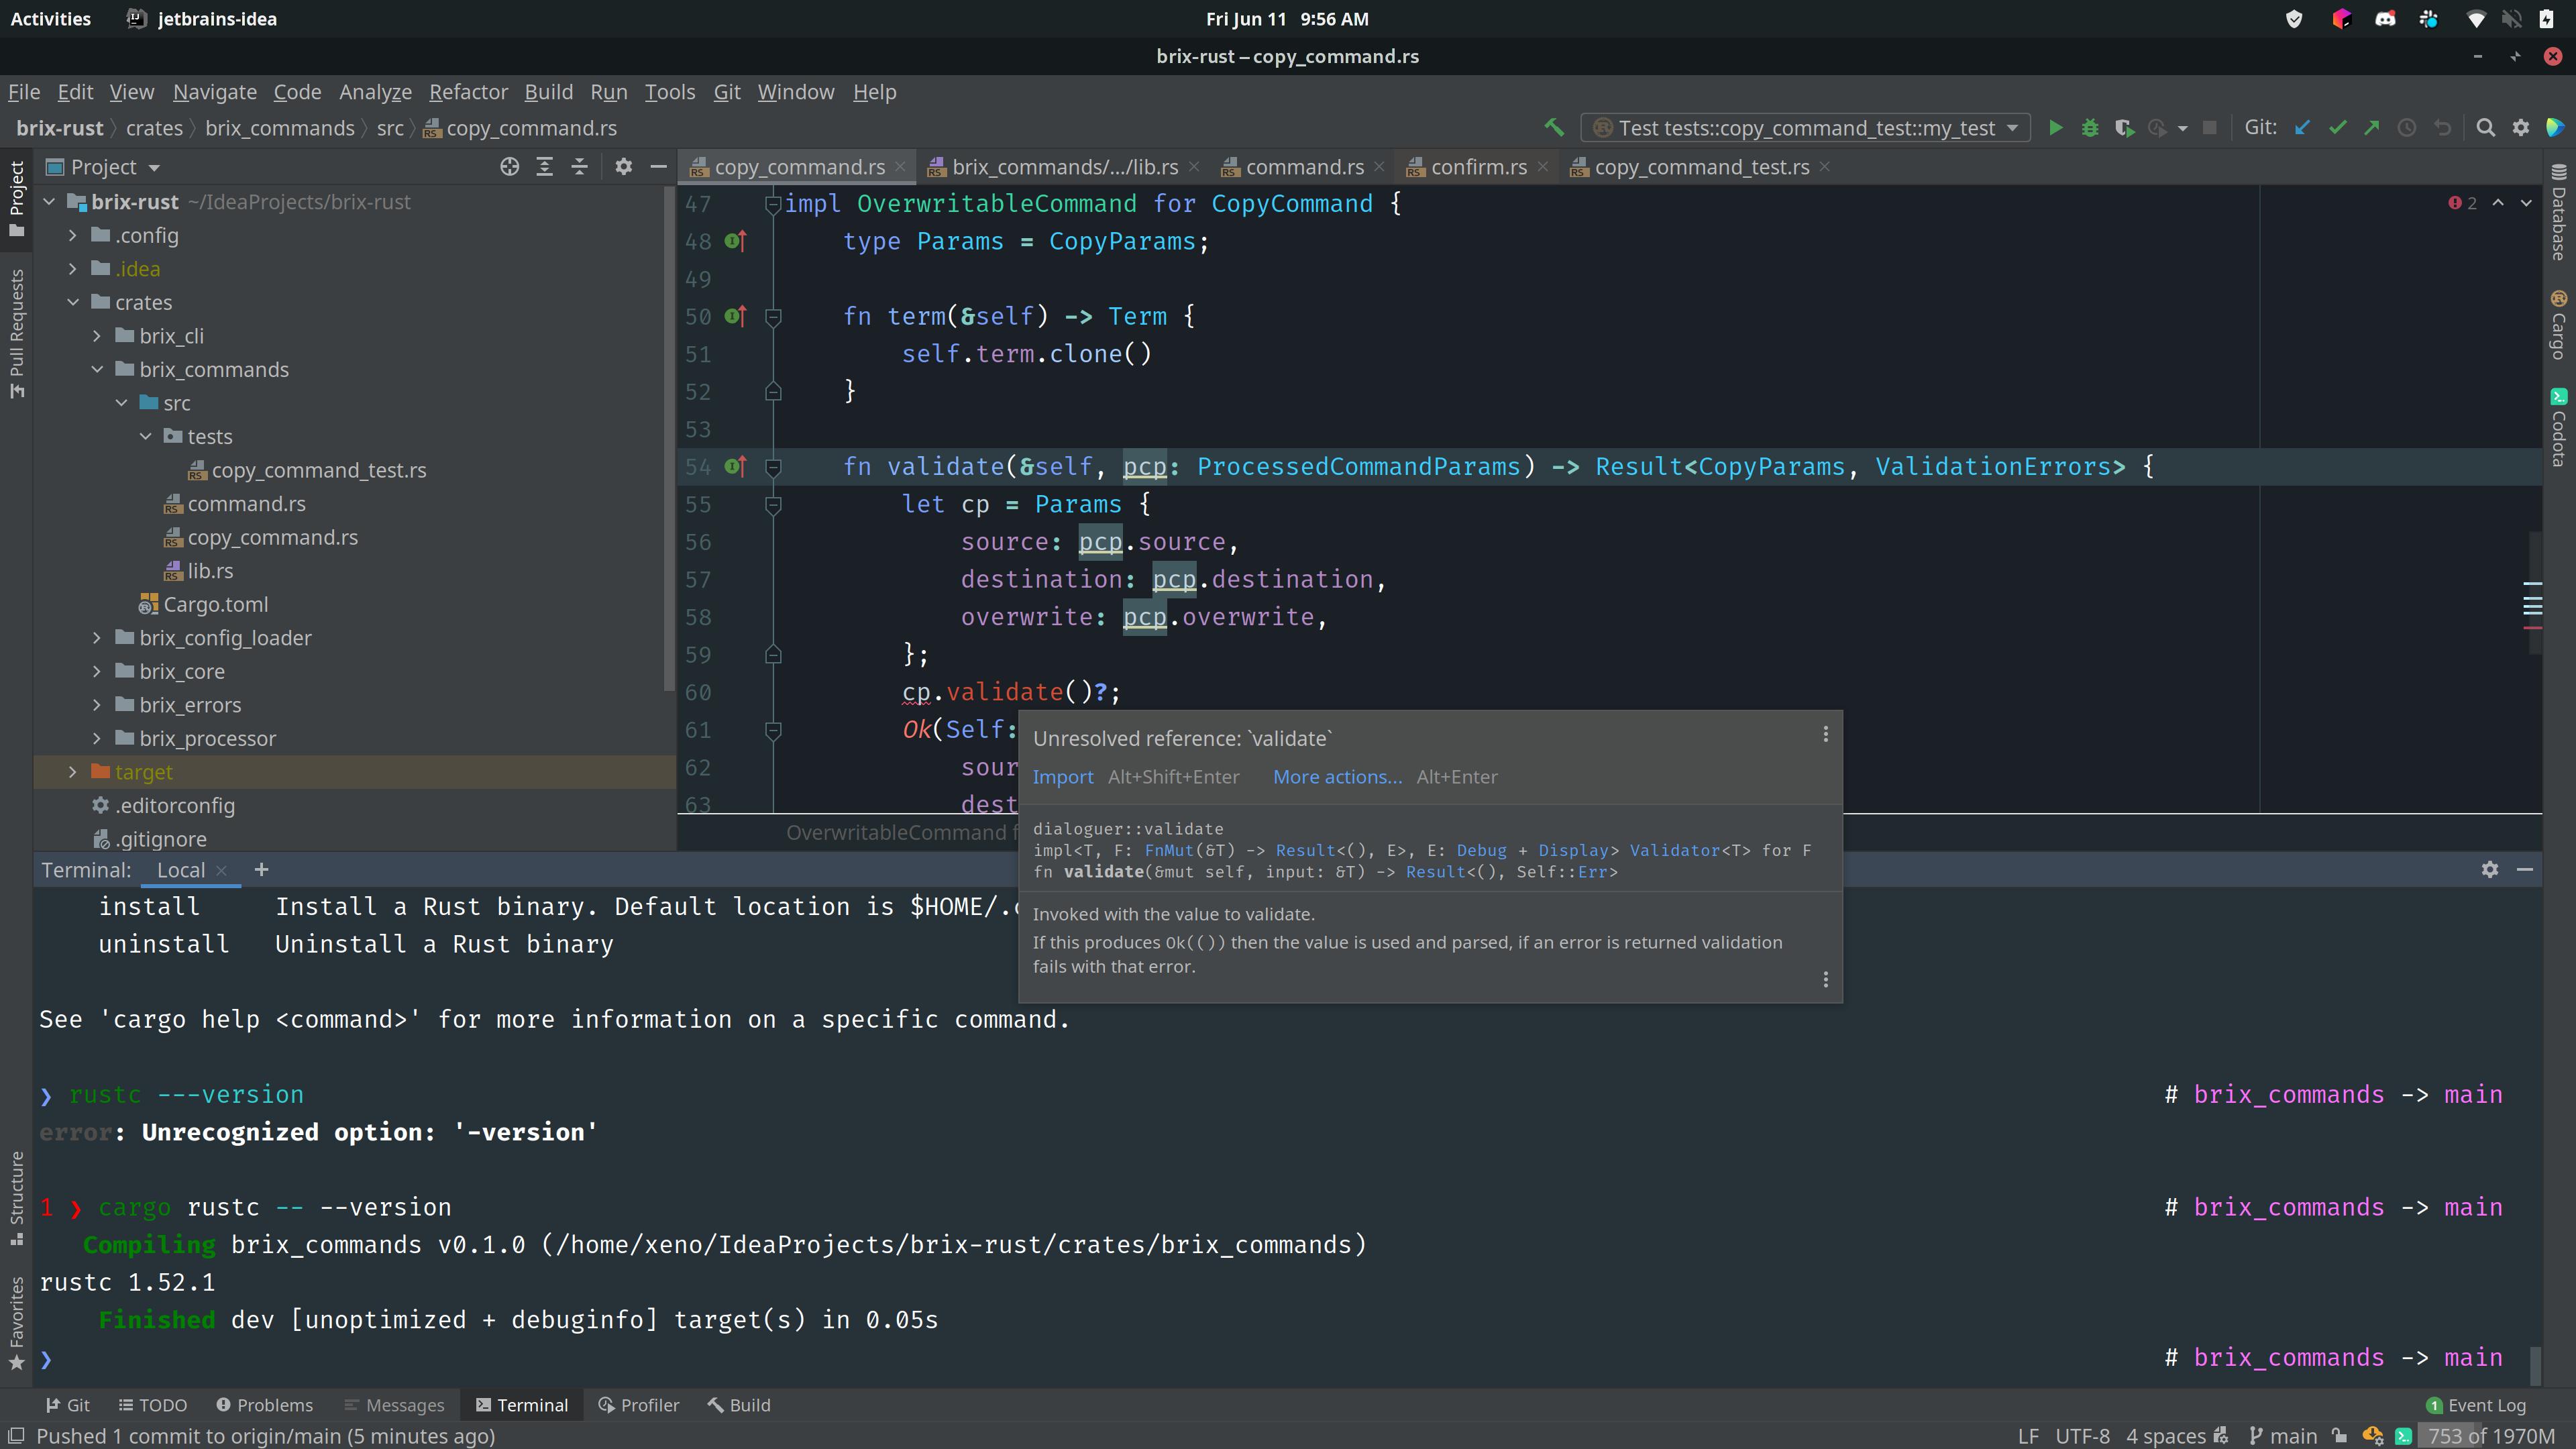 ide screenshot of problem